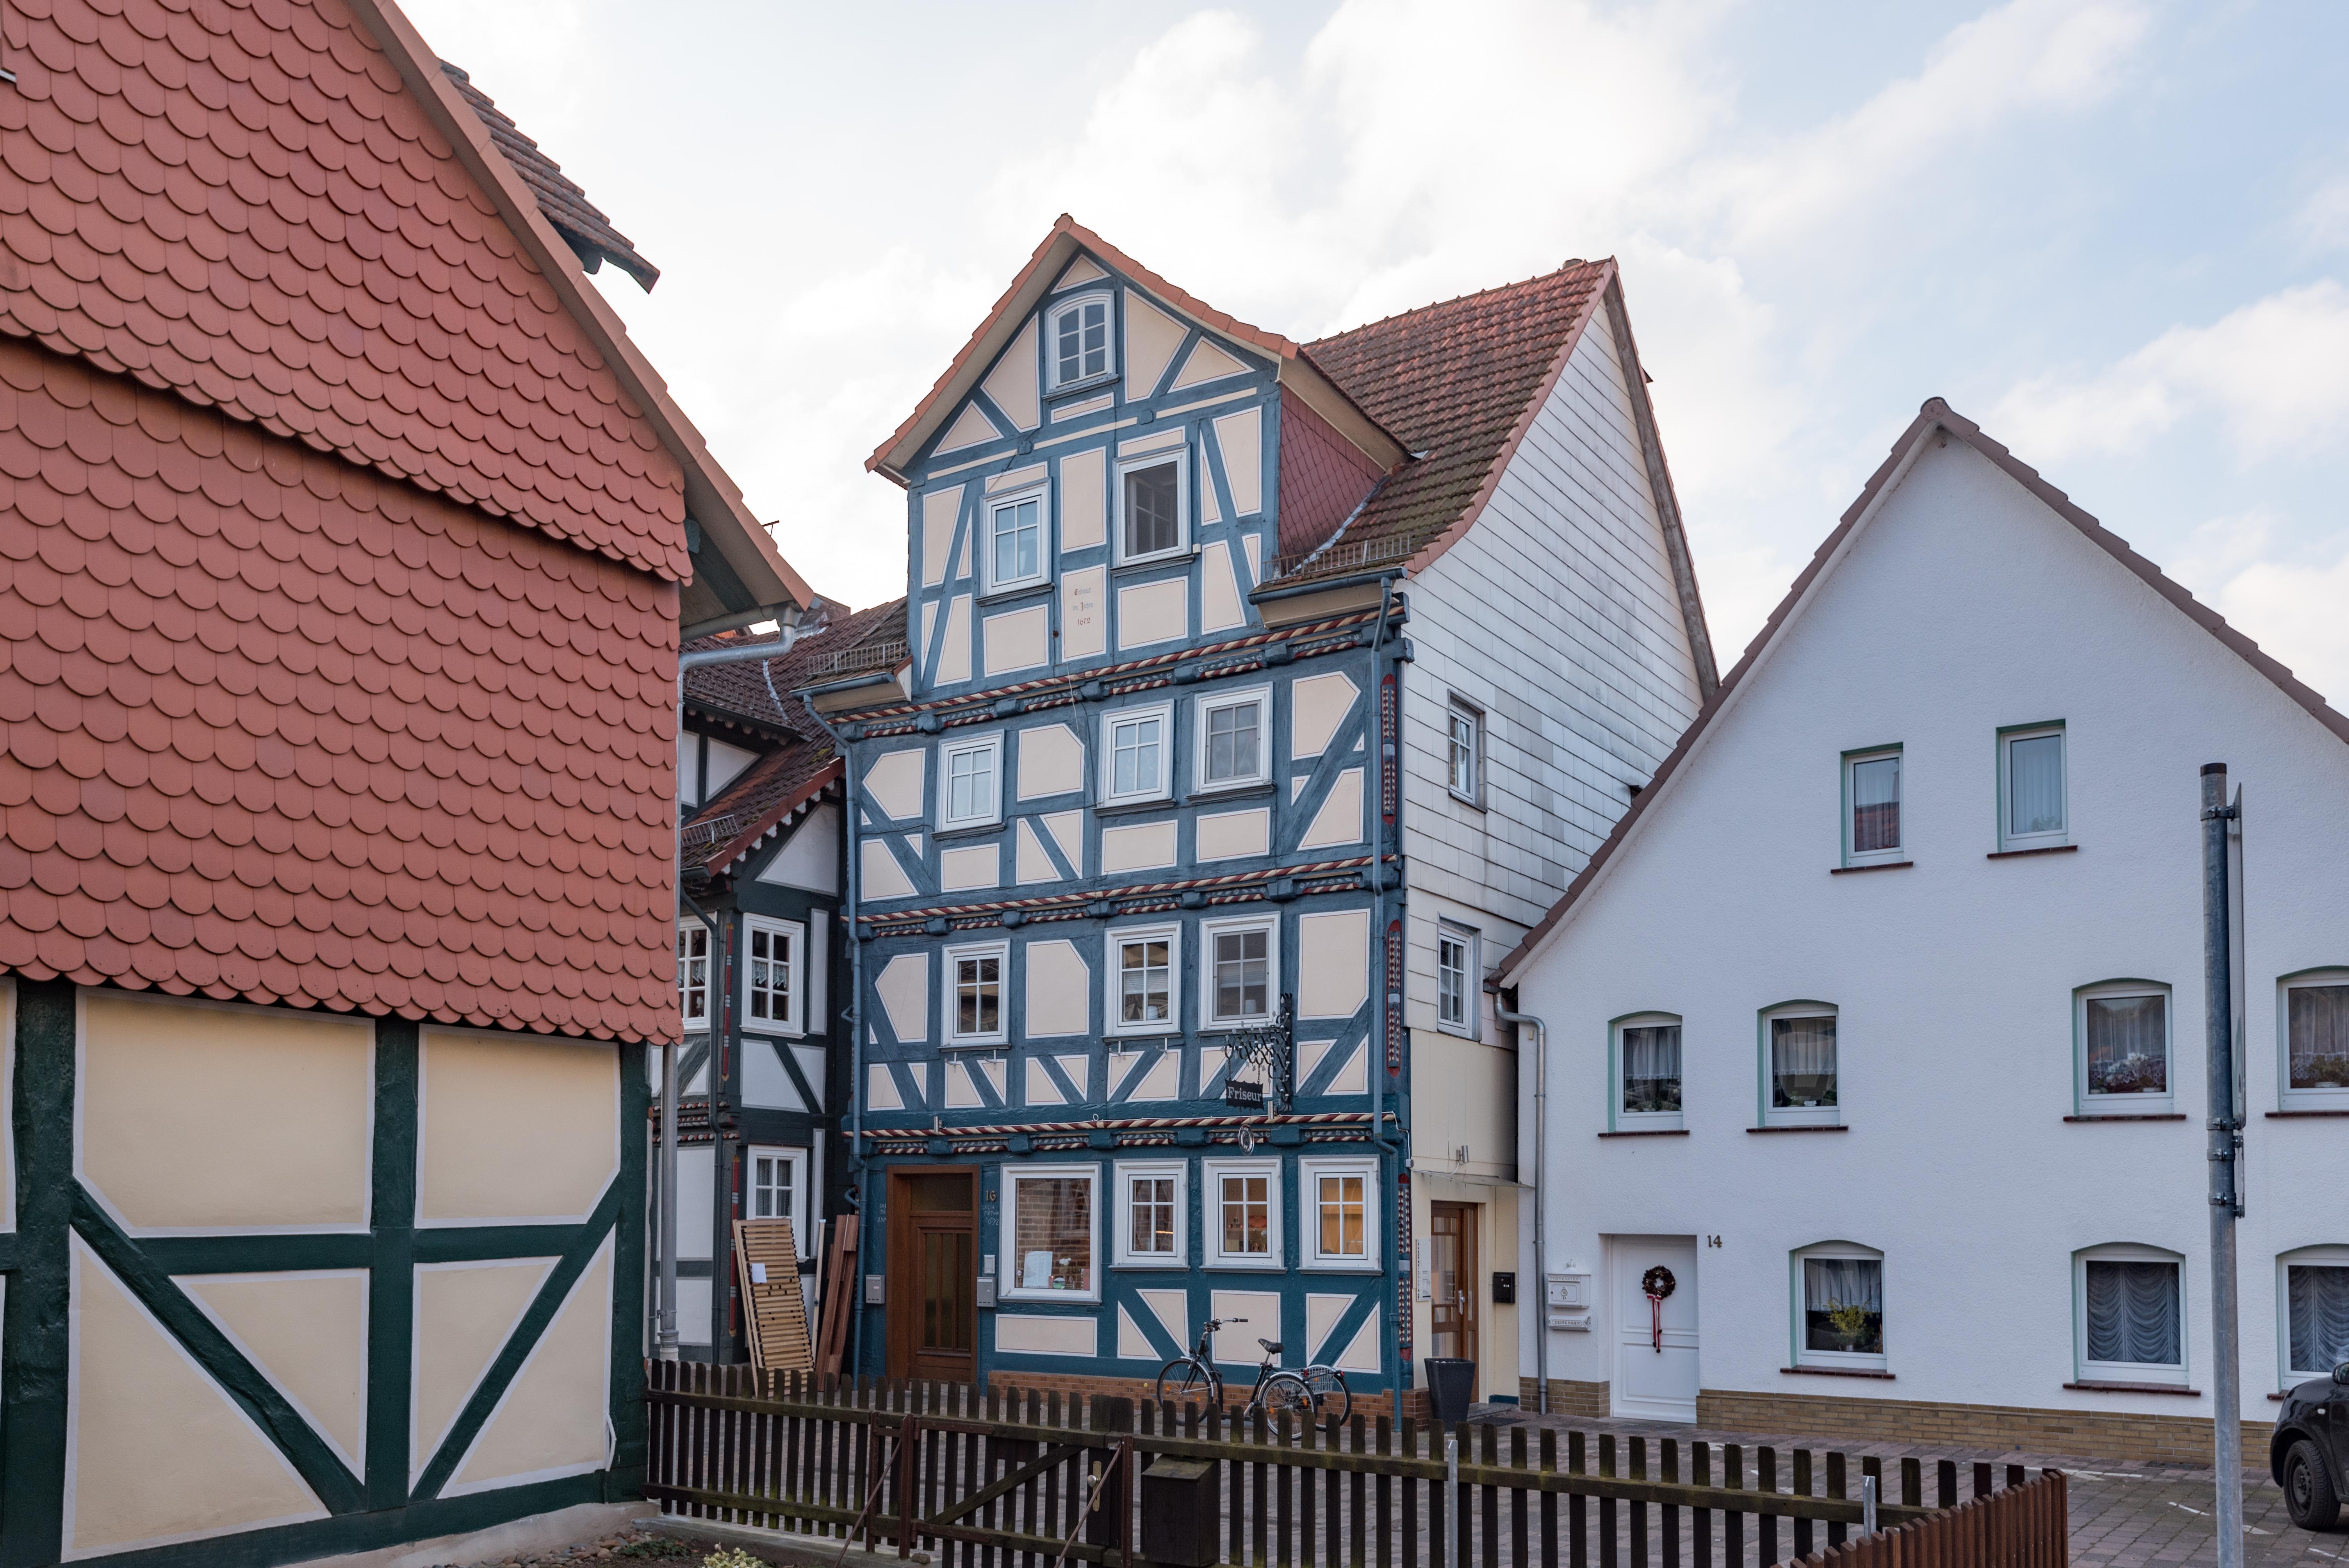 Dateibrotgasse 16 Rotenburg An Der Fulda 20180223 002jpg Wikipedia